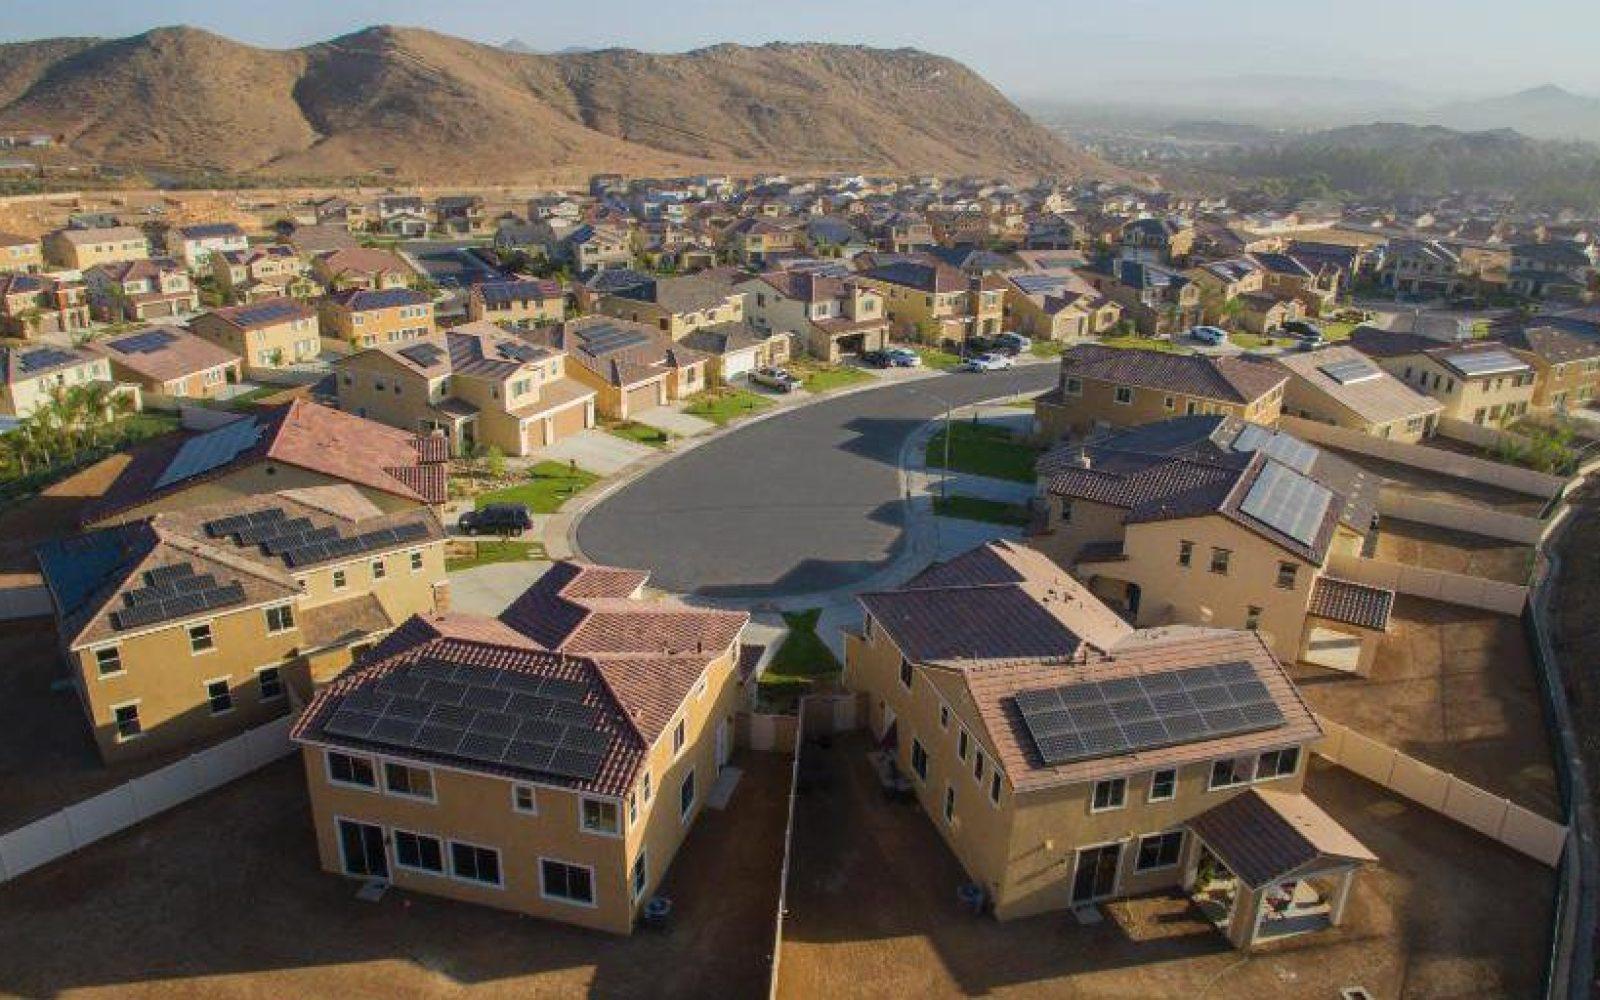 Electrek green energy brief: US solar power doubles, Solar panel manufacturing in California, NE USA energy politics